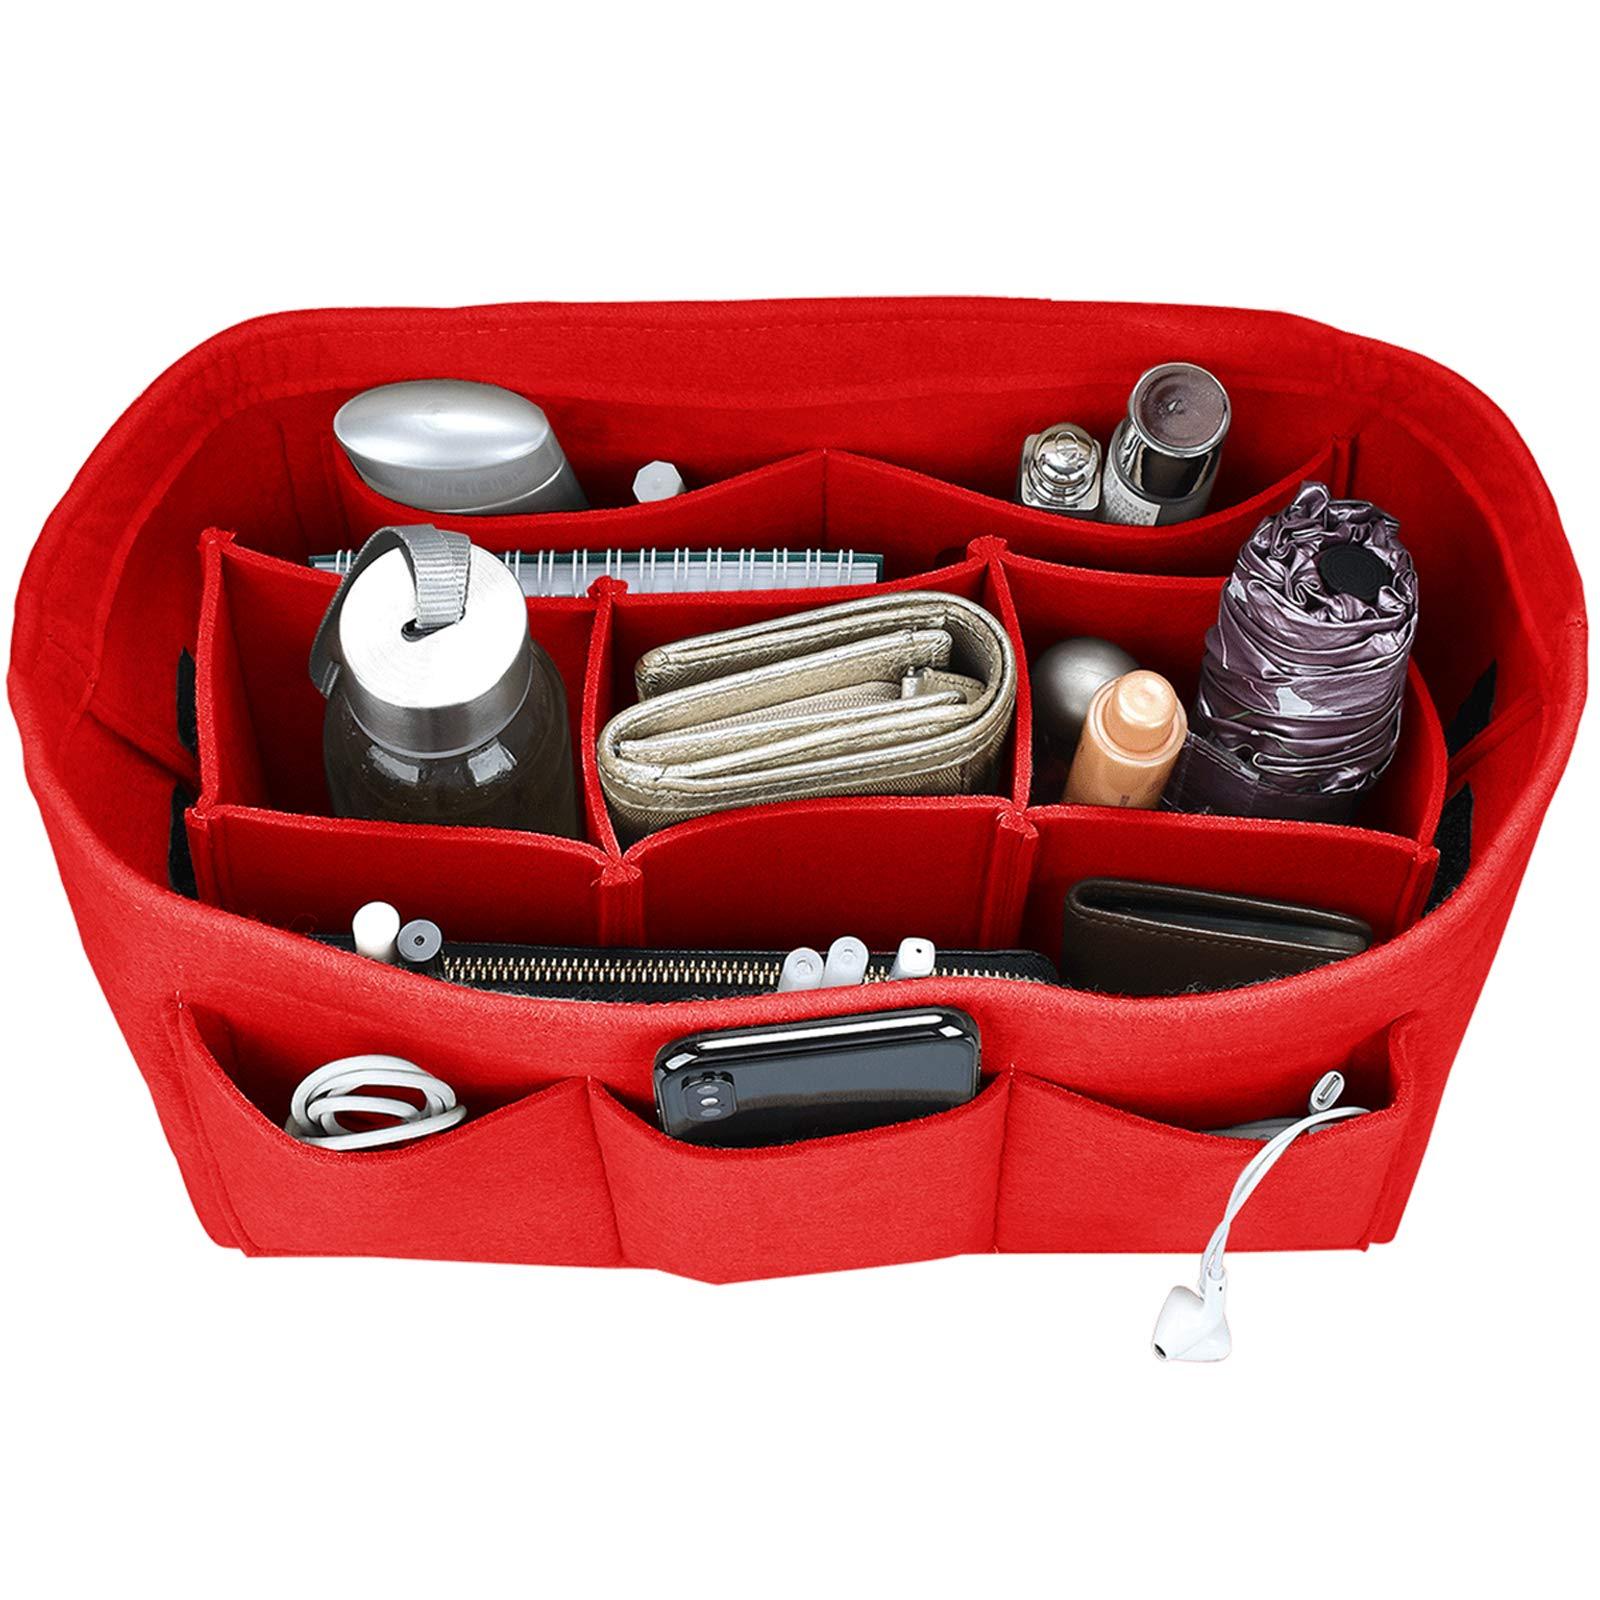 Felt Purse Insert Organizer, Handbag Organizer, Bag in Bag for Handbag Purse Tote, Diaper Bag Organizer, Stand on Its Own,12 Compartments, 4 Sizes (XX-Large, Red)